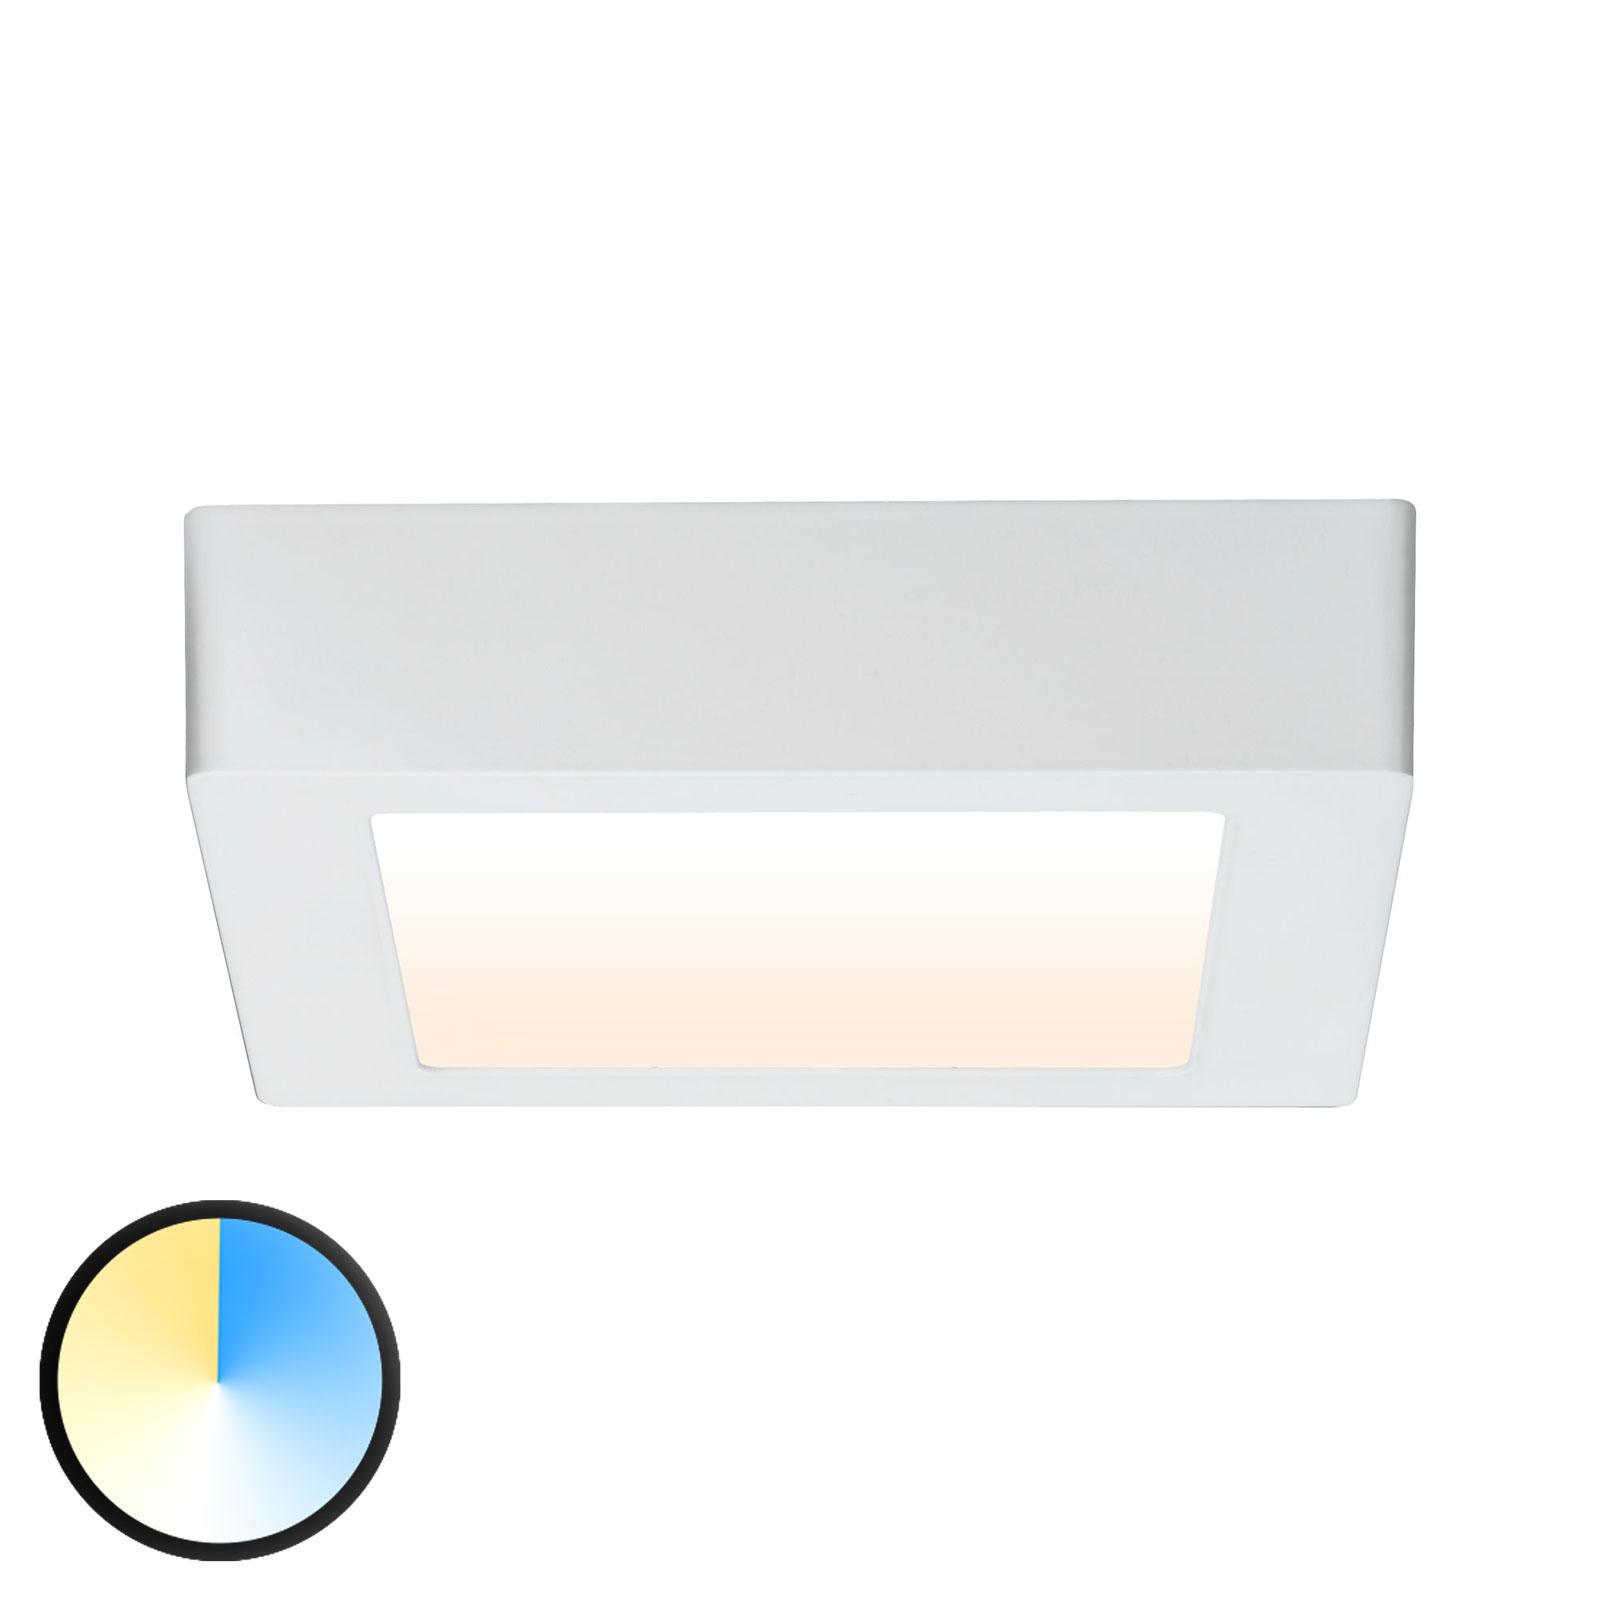 Paulmann Carpo LED plafondlamp wit 17x17cm